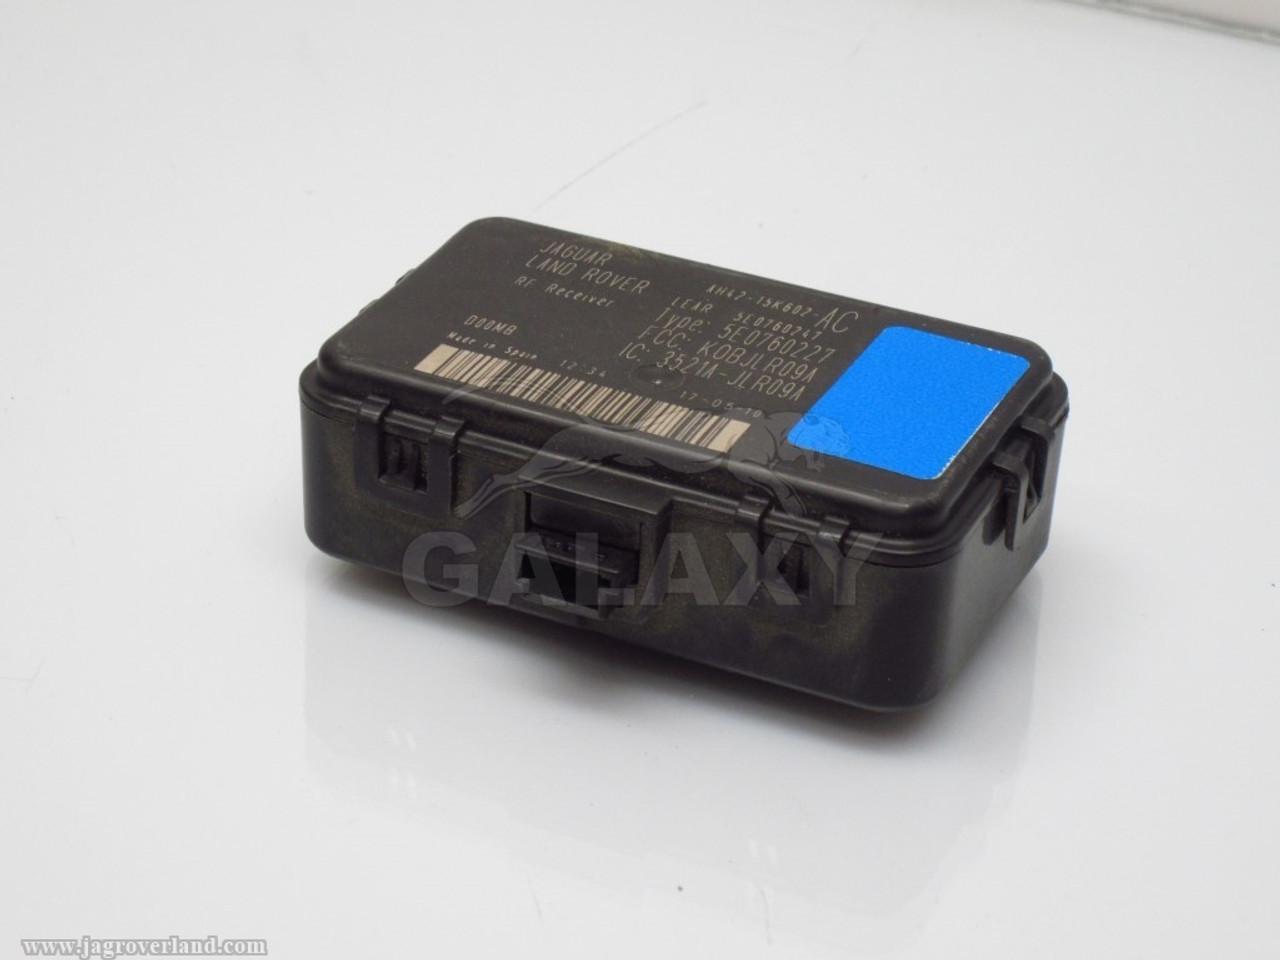 10-17 XJ XF Xe F-Type F-Pace Central Locking 315Mhz Antenna Module Ah42-15K602-Ac C2D4232 ...